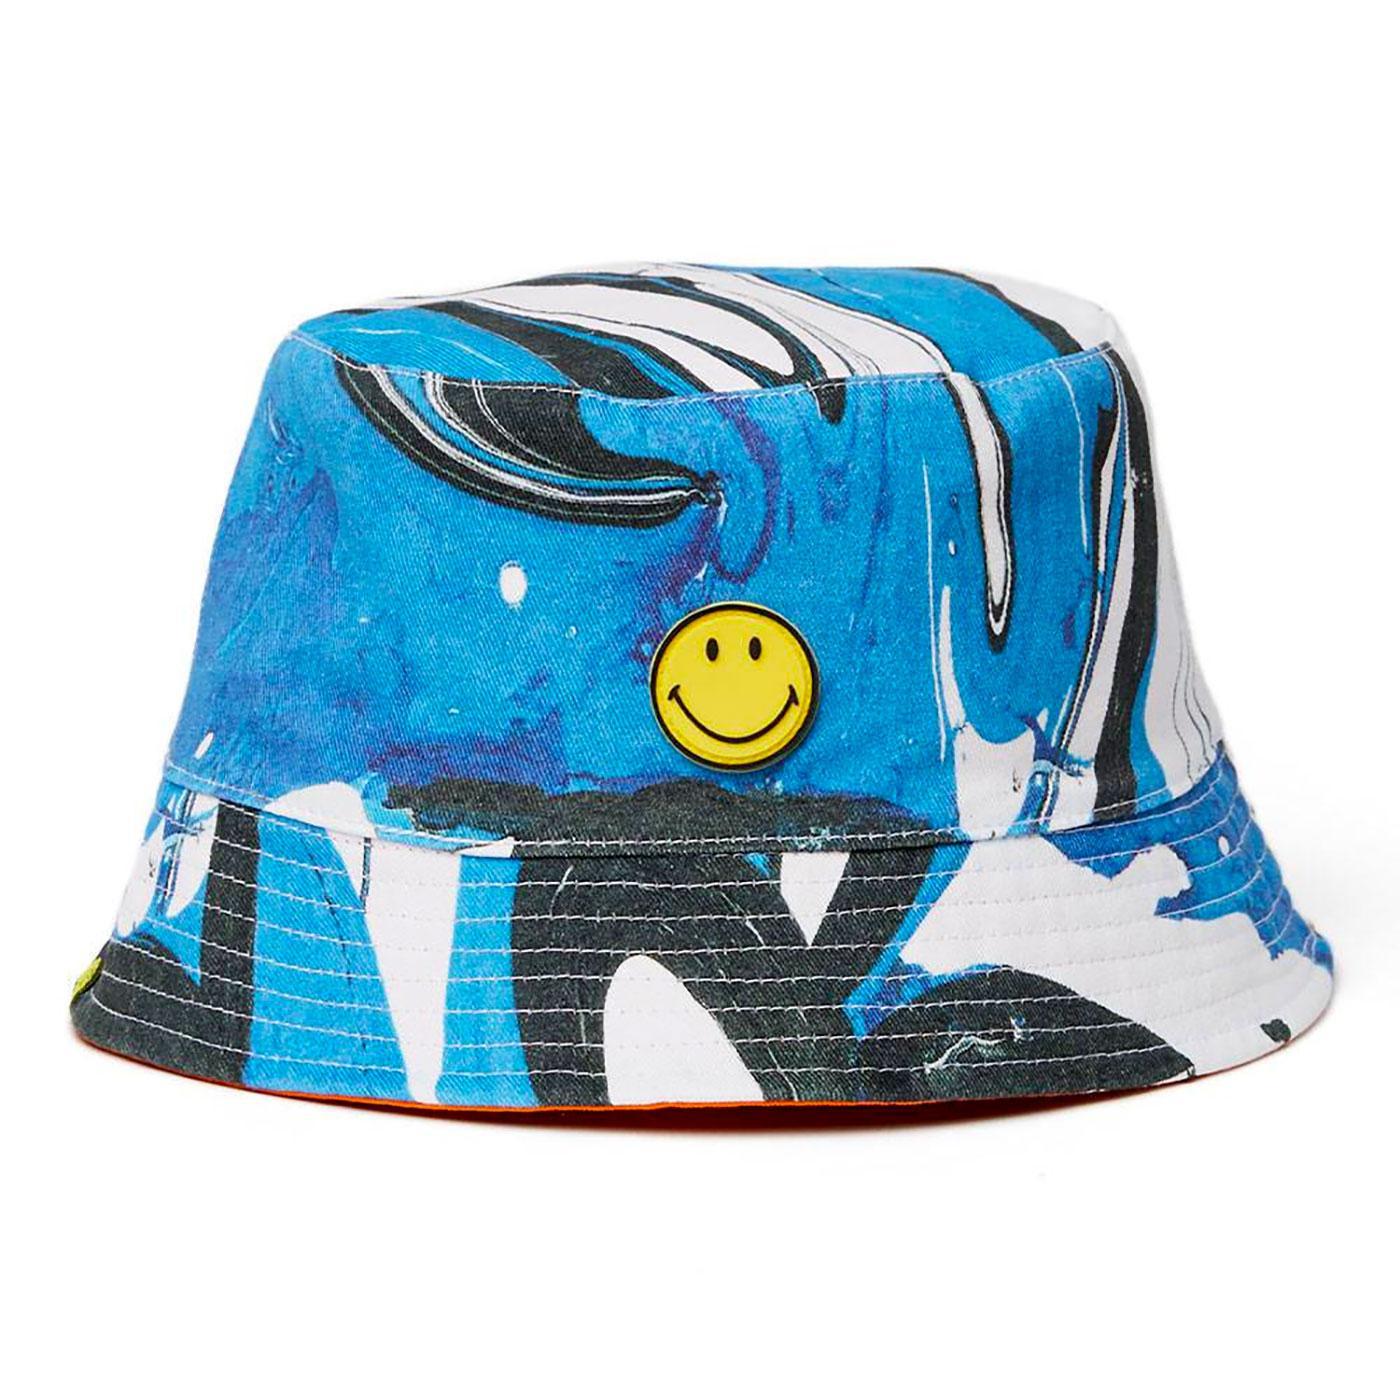 PRETTY GREEN X SMILEY® Retro 90's Bucket Hat BLUE